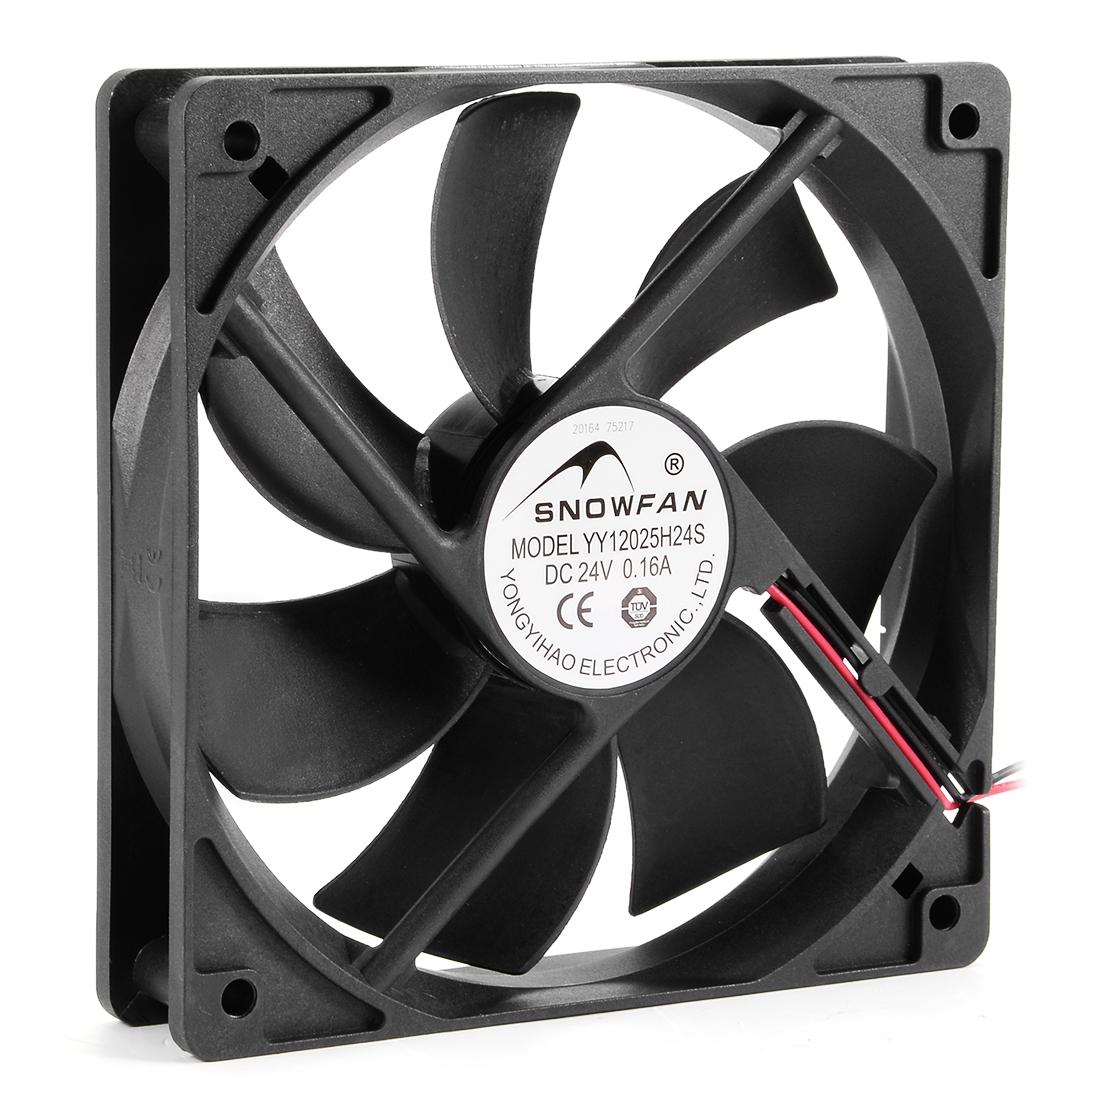 120mm x 25mm 24V DC Cooling Fan Long Life Sleeve Bearing Computer Case Fan